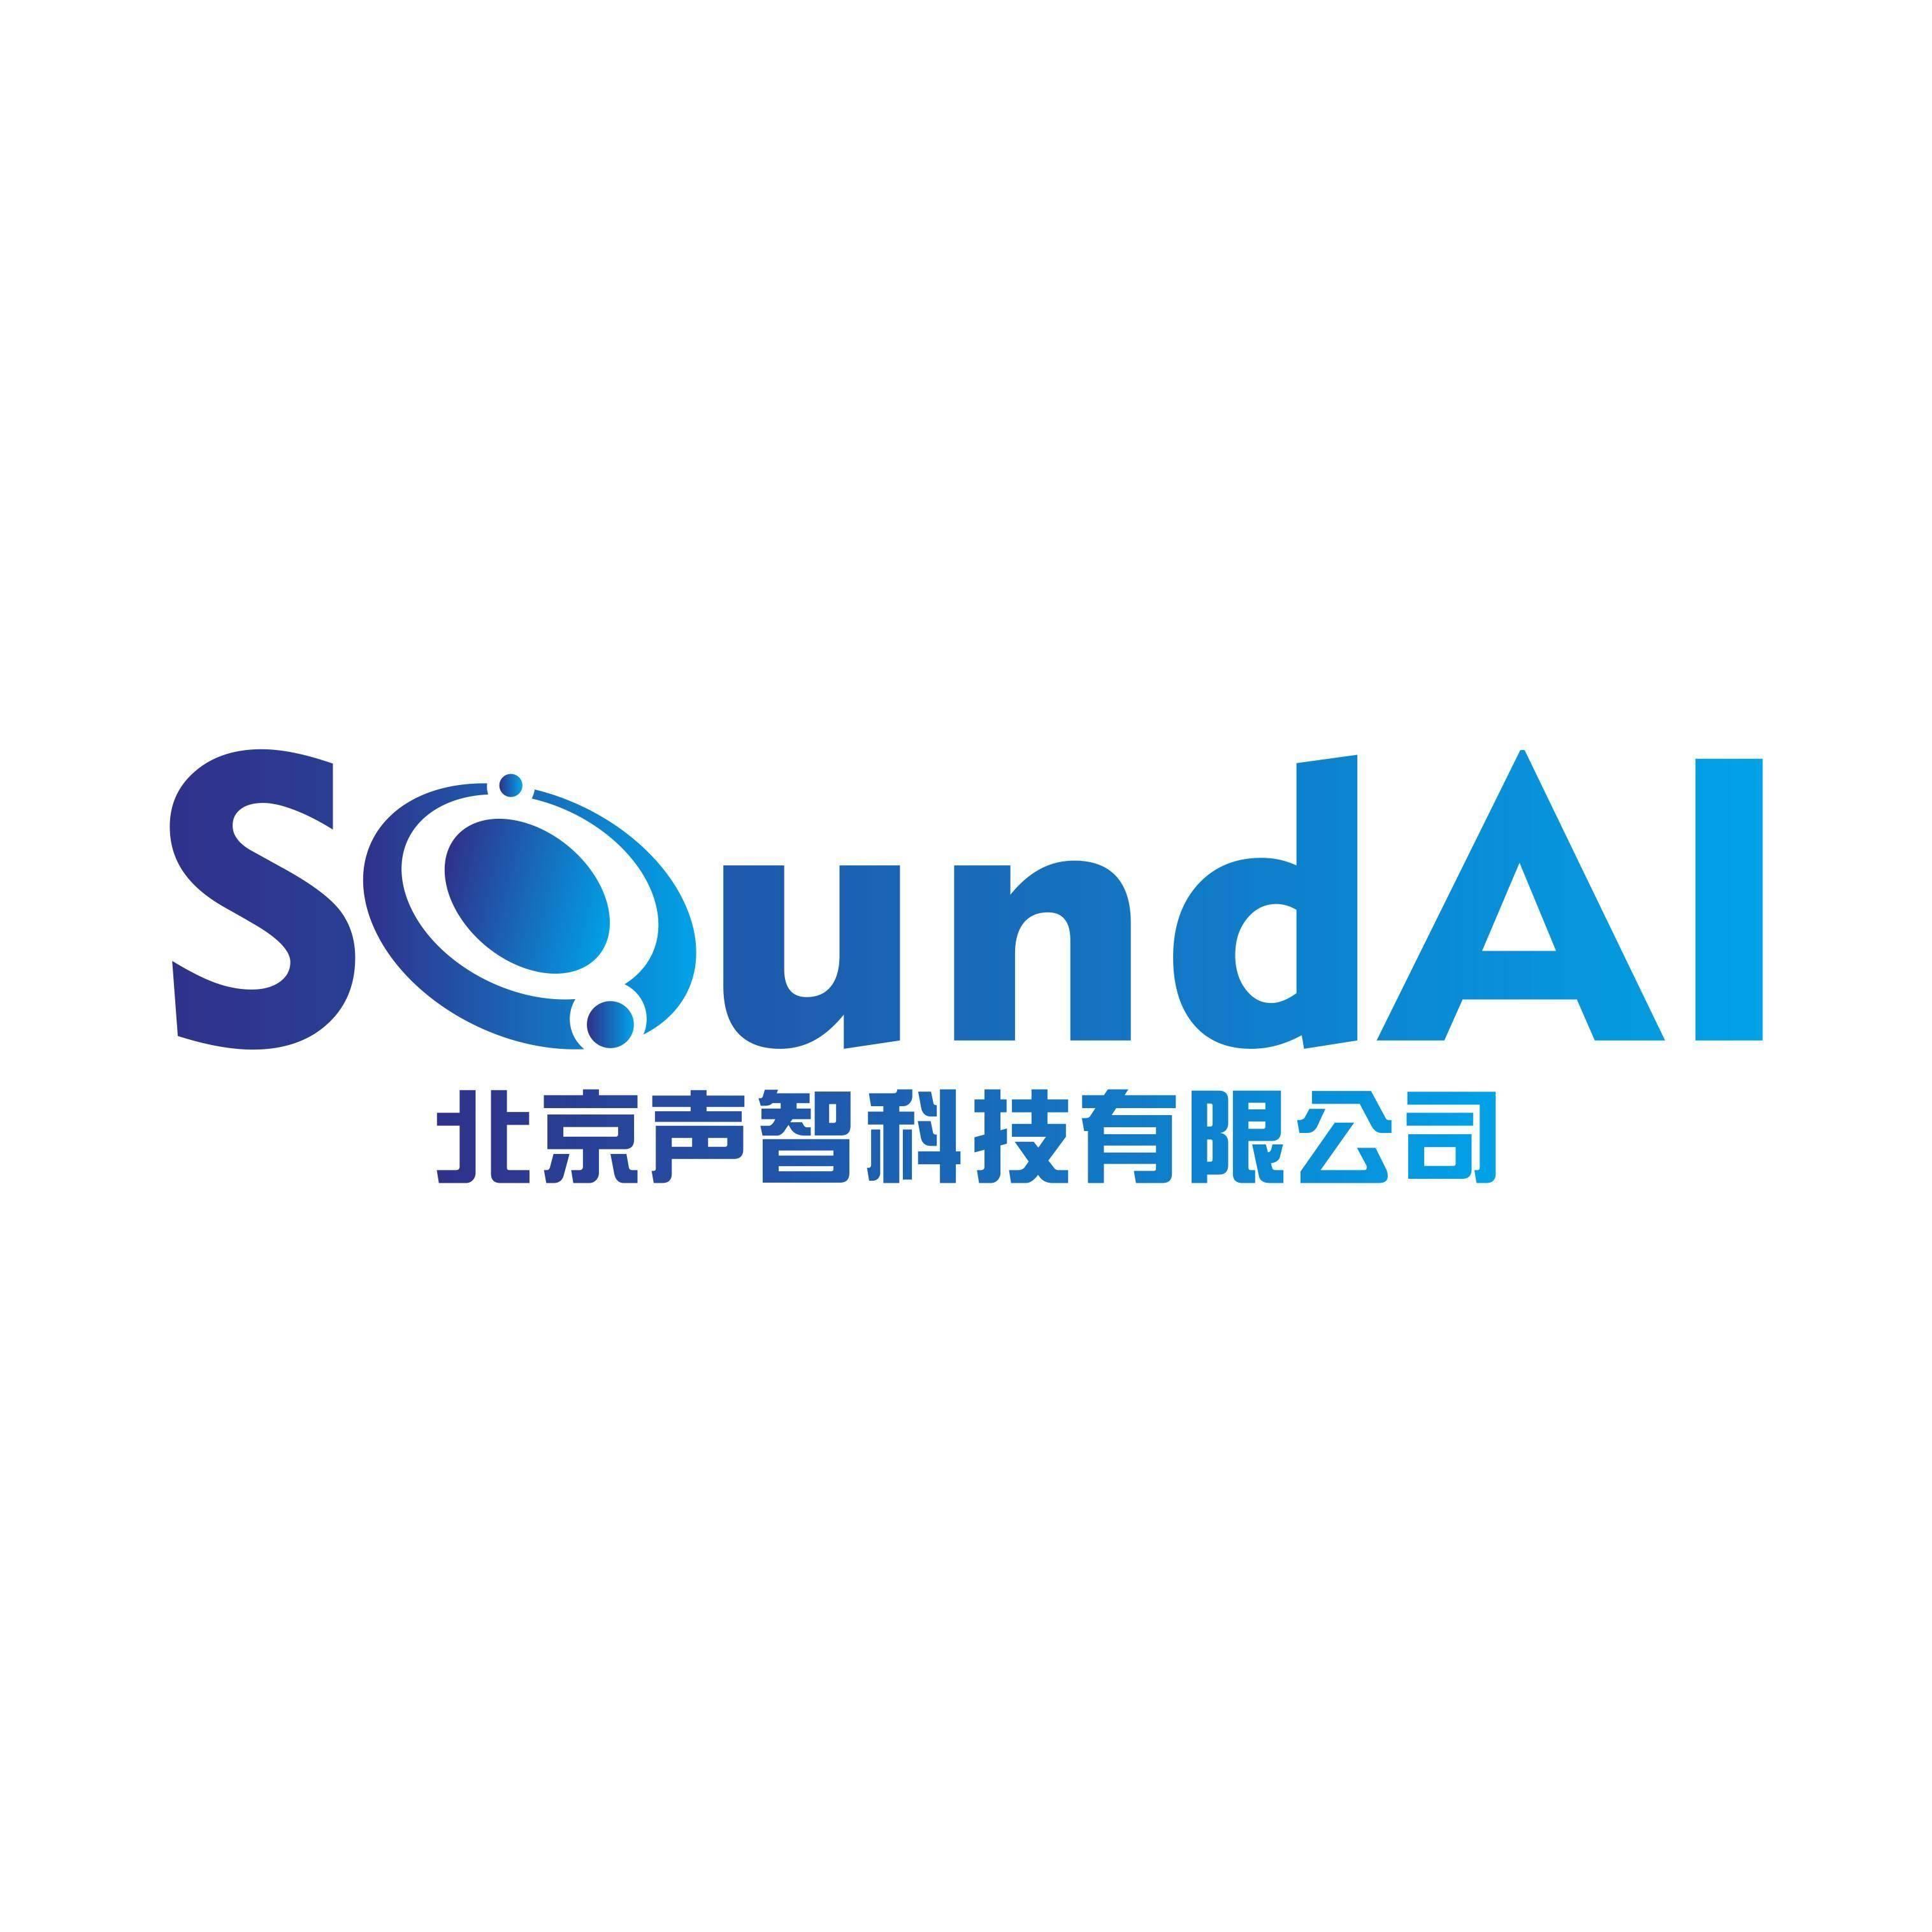 SoundAI